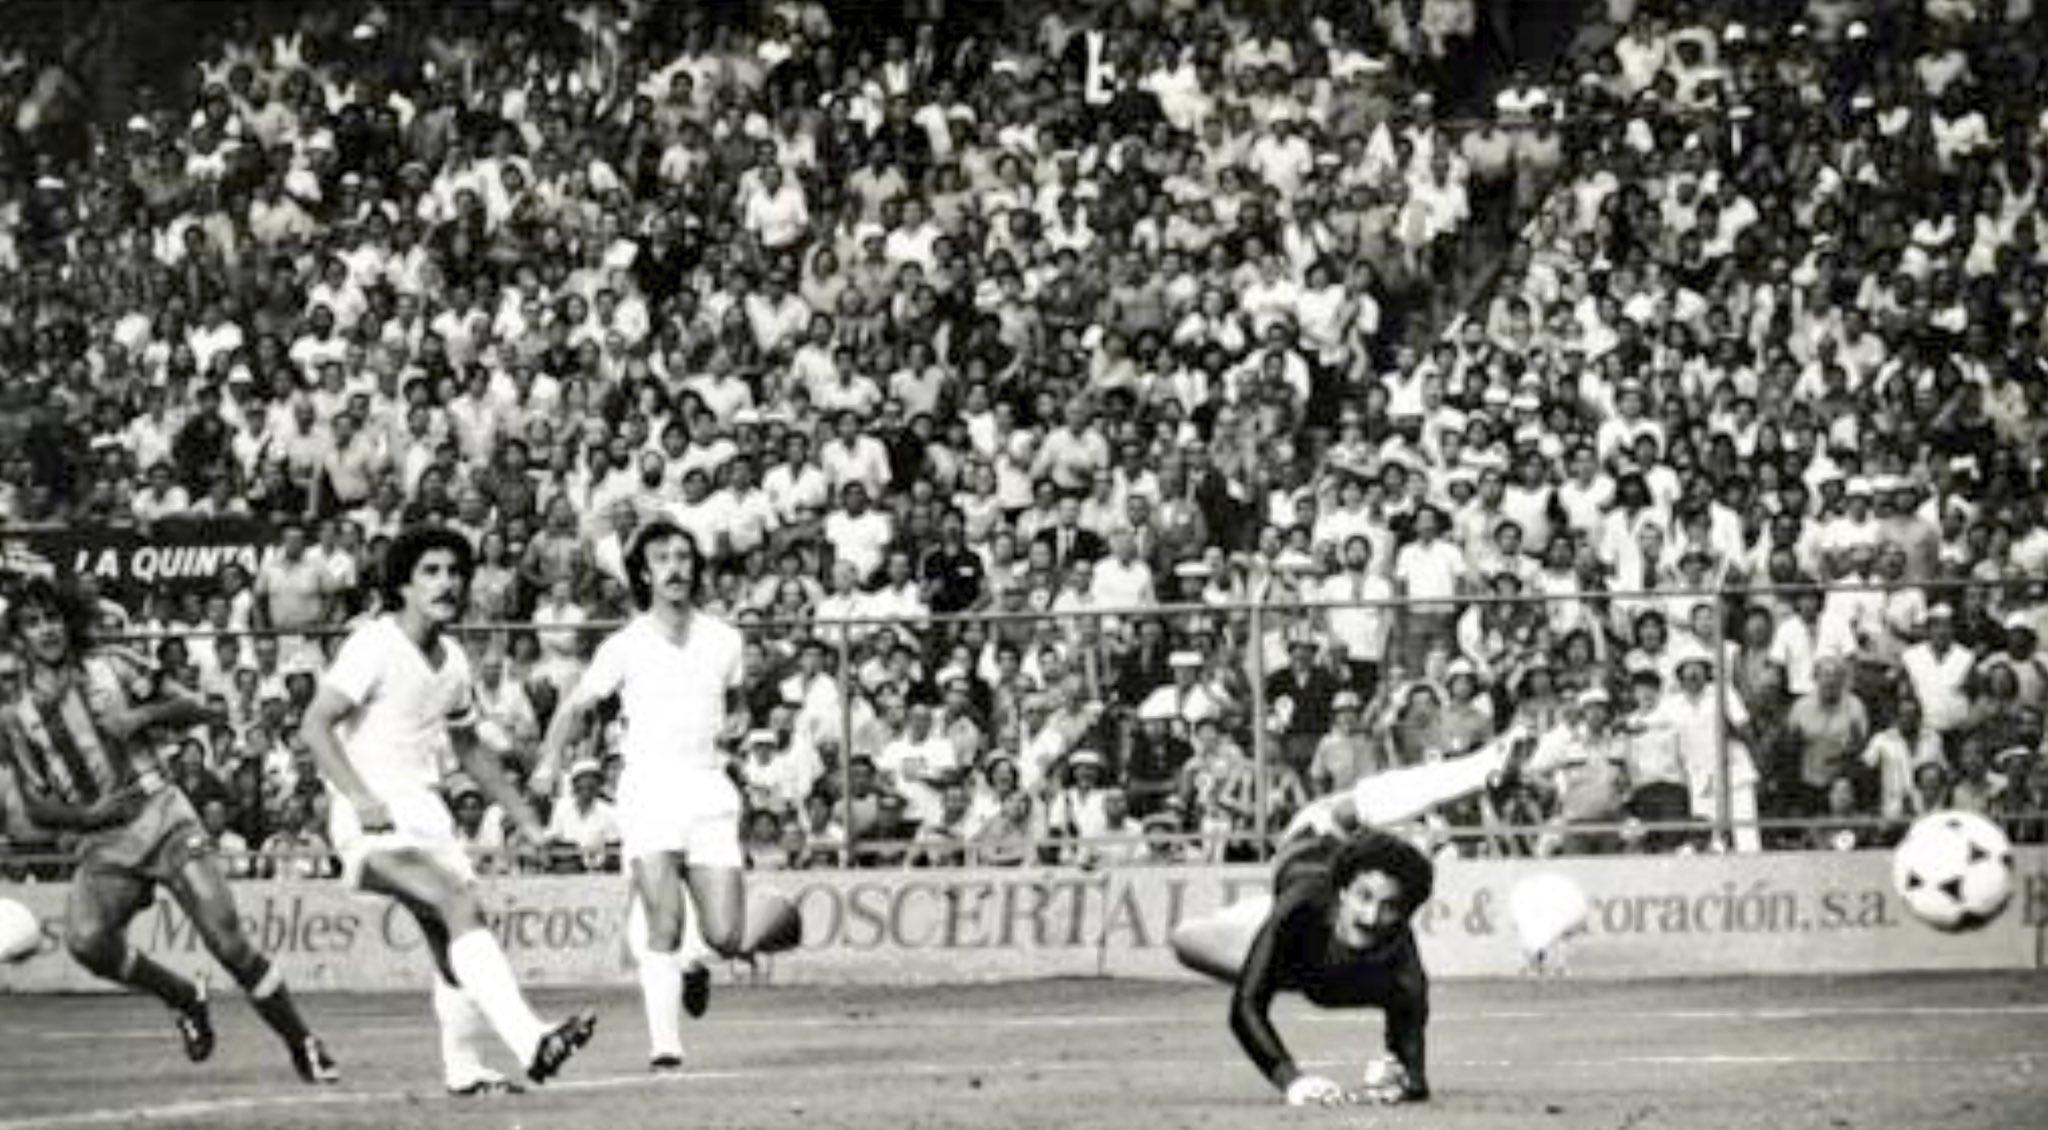 FOTOS HISTORICAS O CHULAS  DE FUTBOL - Página 20 DnPiV8jWwAA3wtI